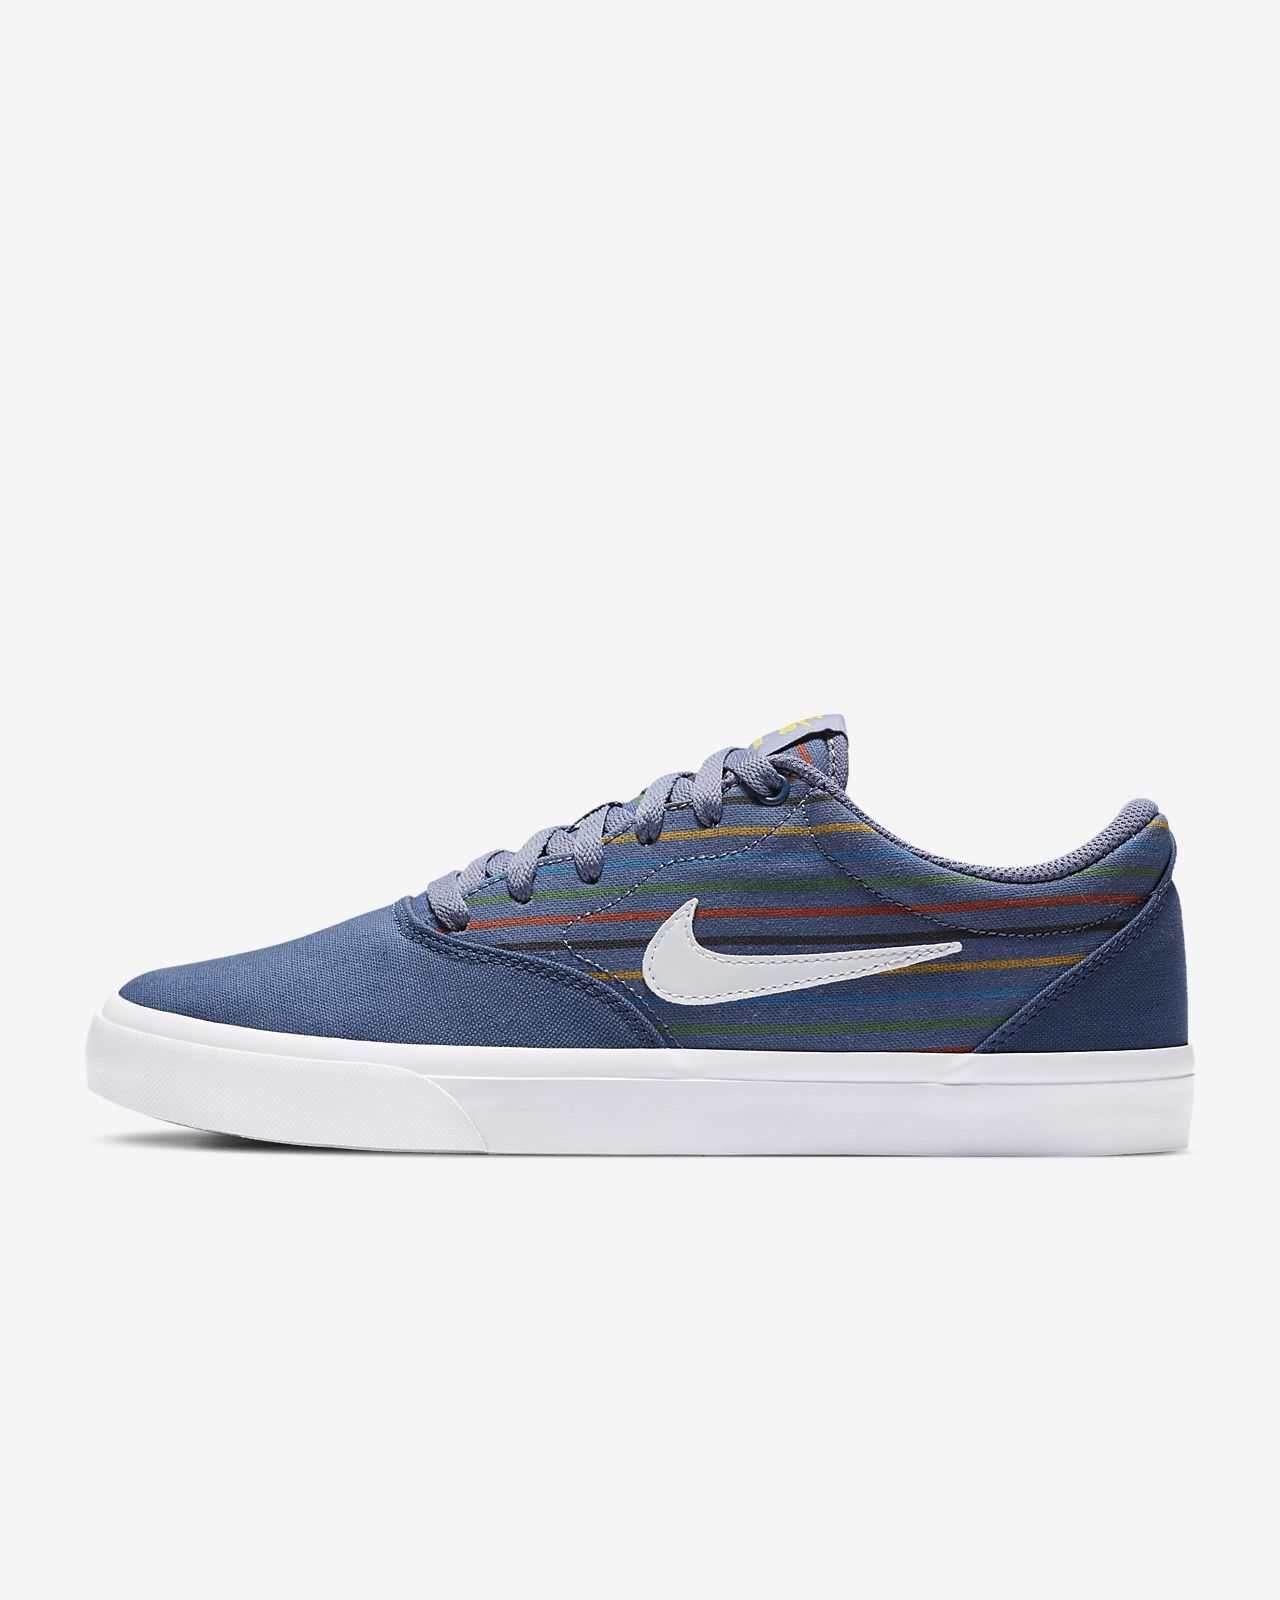 Nike SB Charge CNVS PRM 男/女滑板鞋